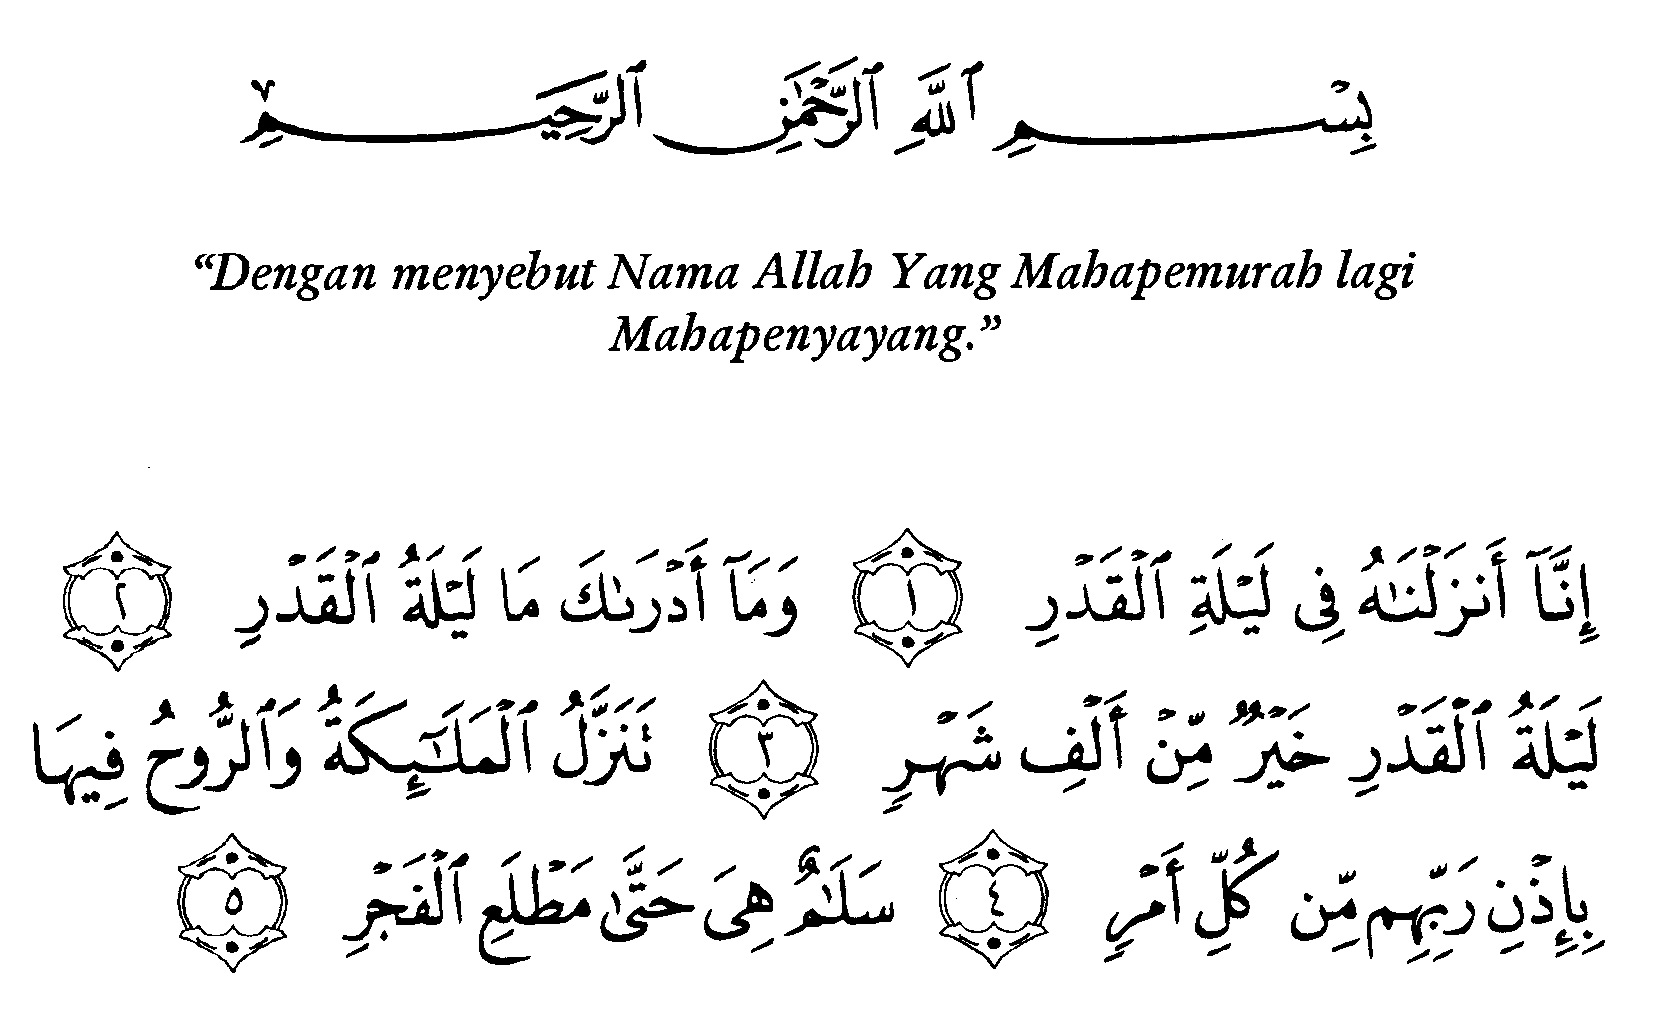 Tafsir Ibnu Katsir Surah Al Qadr Alquranmulia